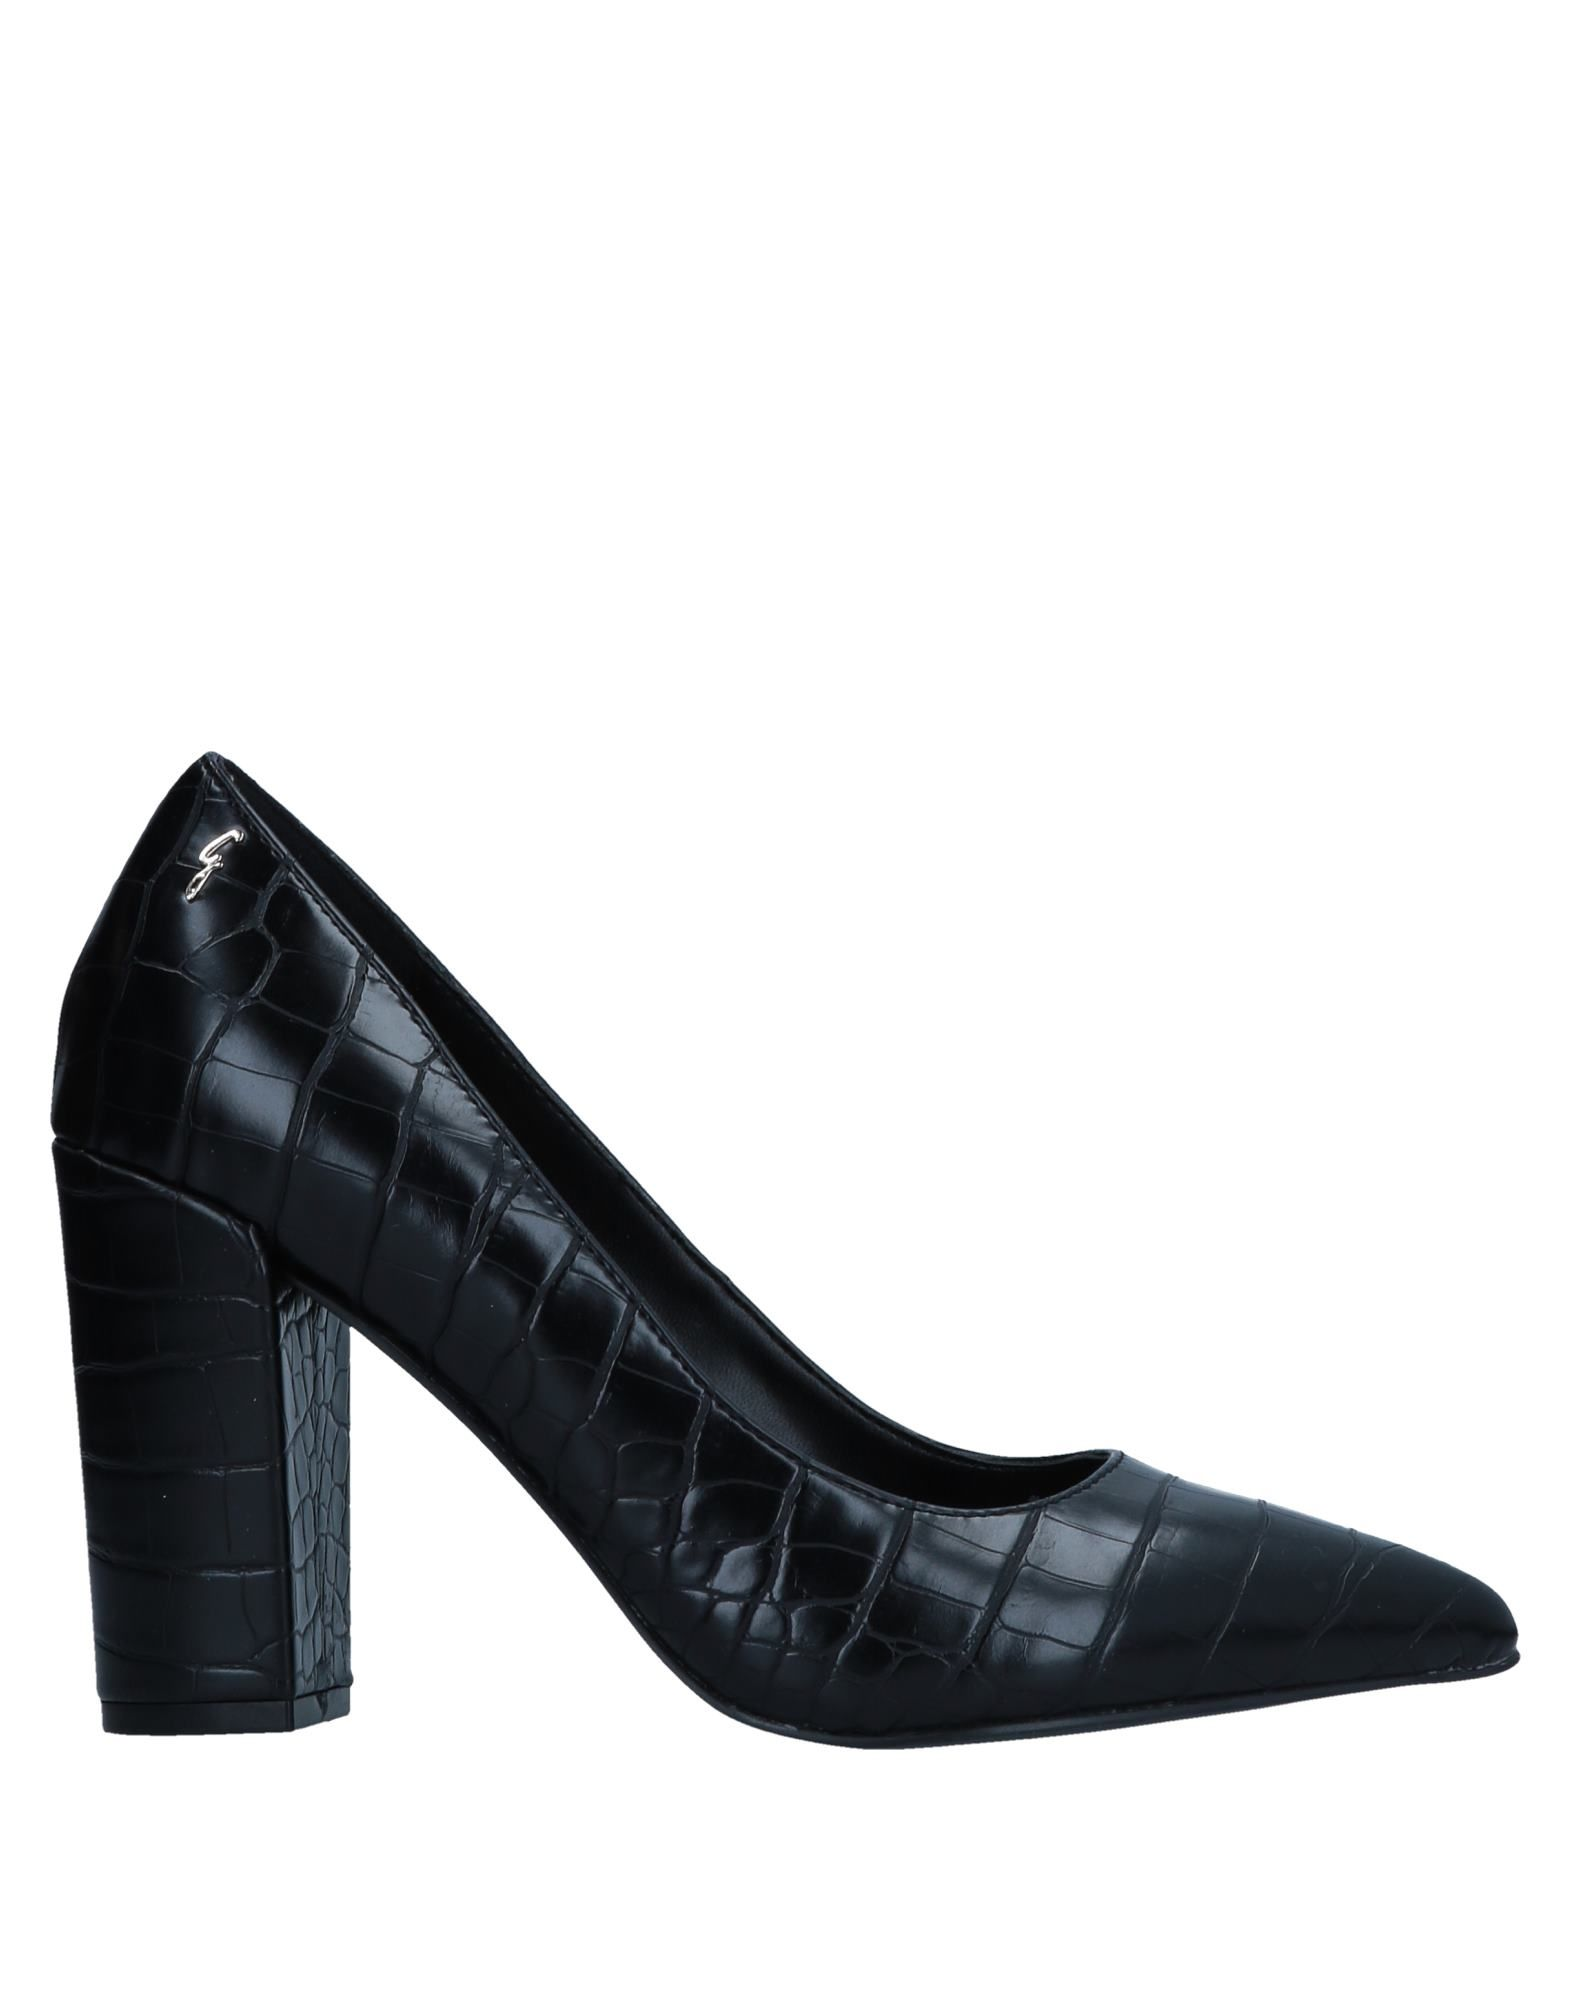 Gattinoni Pumps Damen  11516985GD Gute Qualität beliebte Schuhe